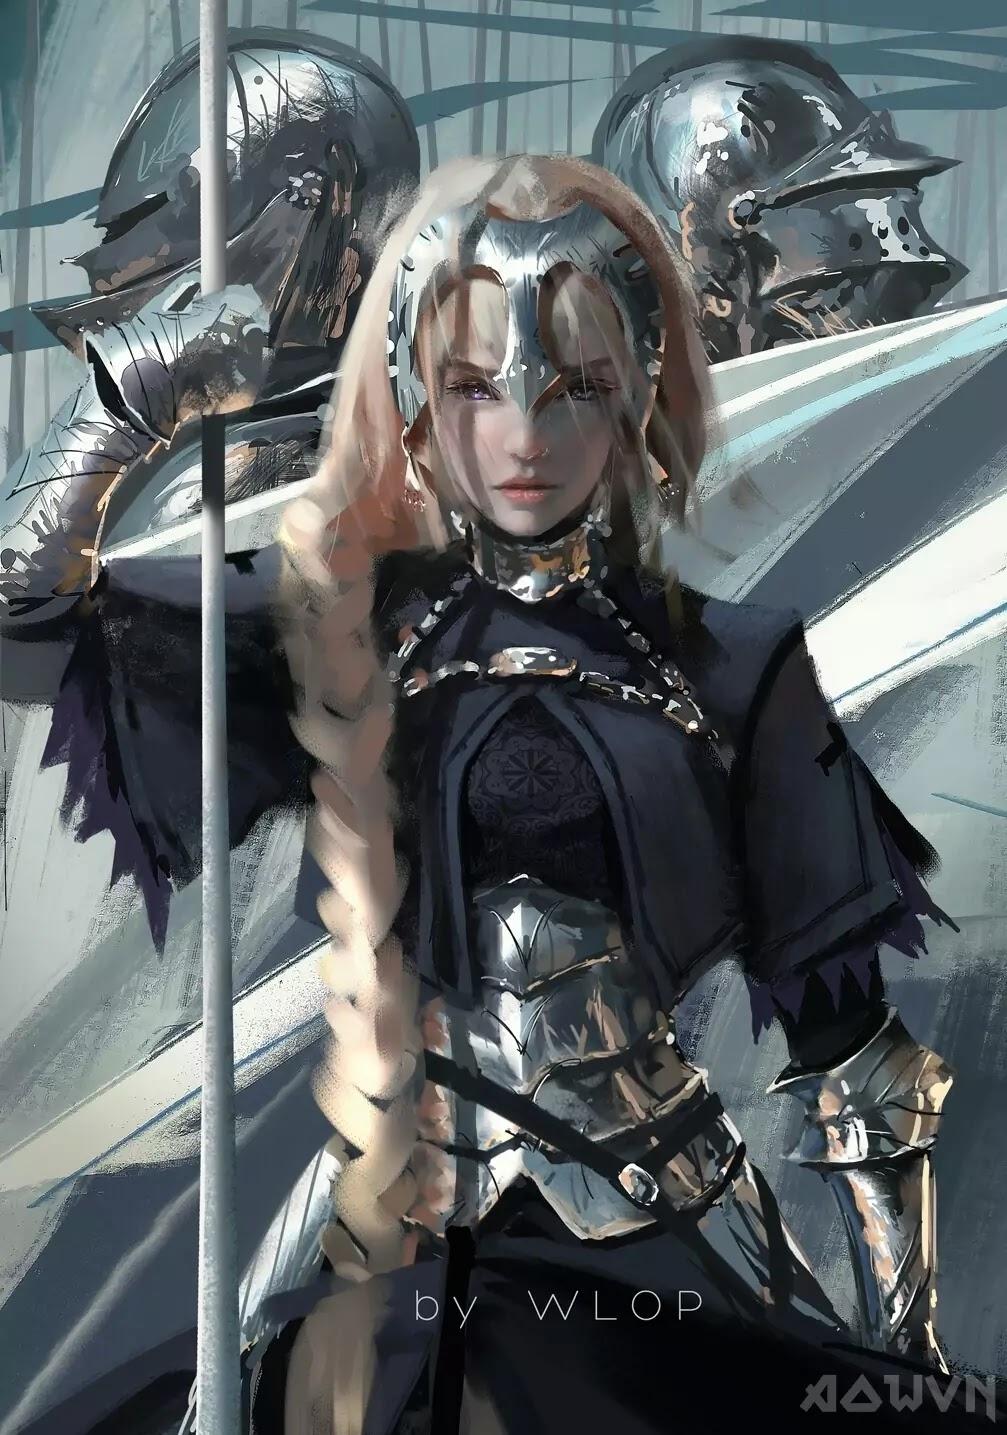 39 AowVN.org m - [ Hình Nền ] Anime Cực Đẹp by Wlop | Wallpaper Premium / Update